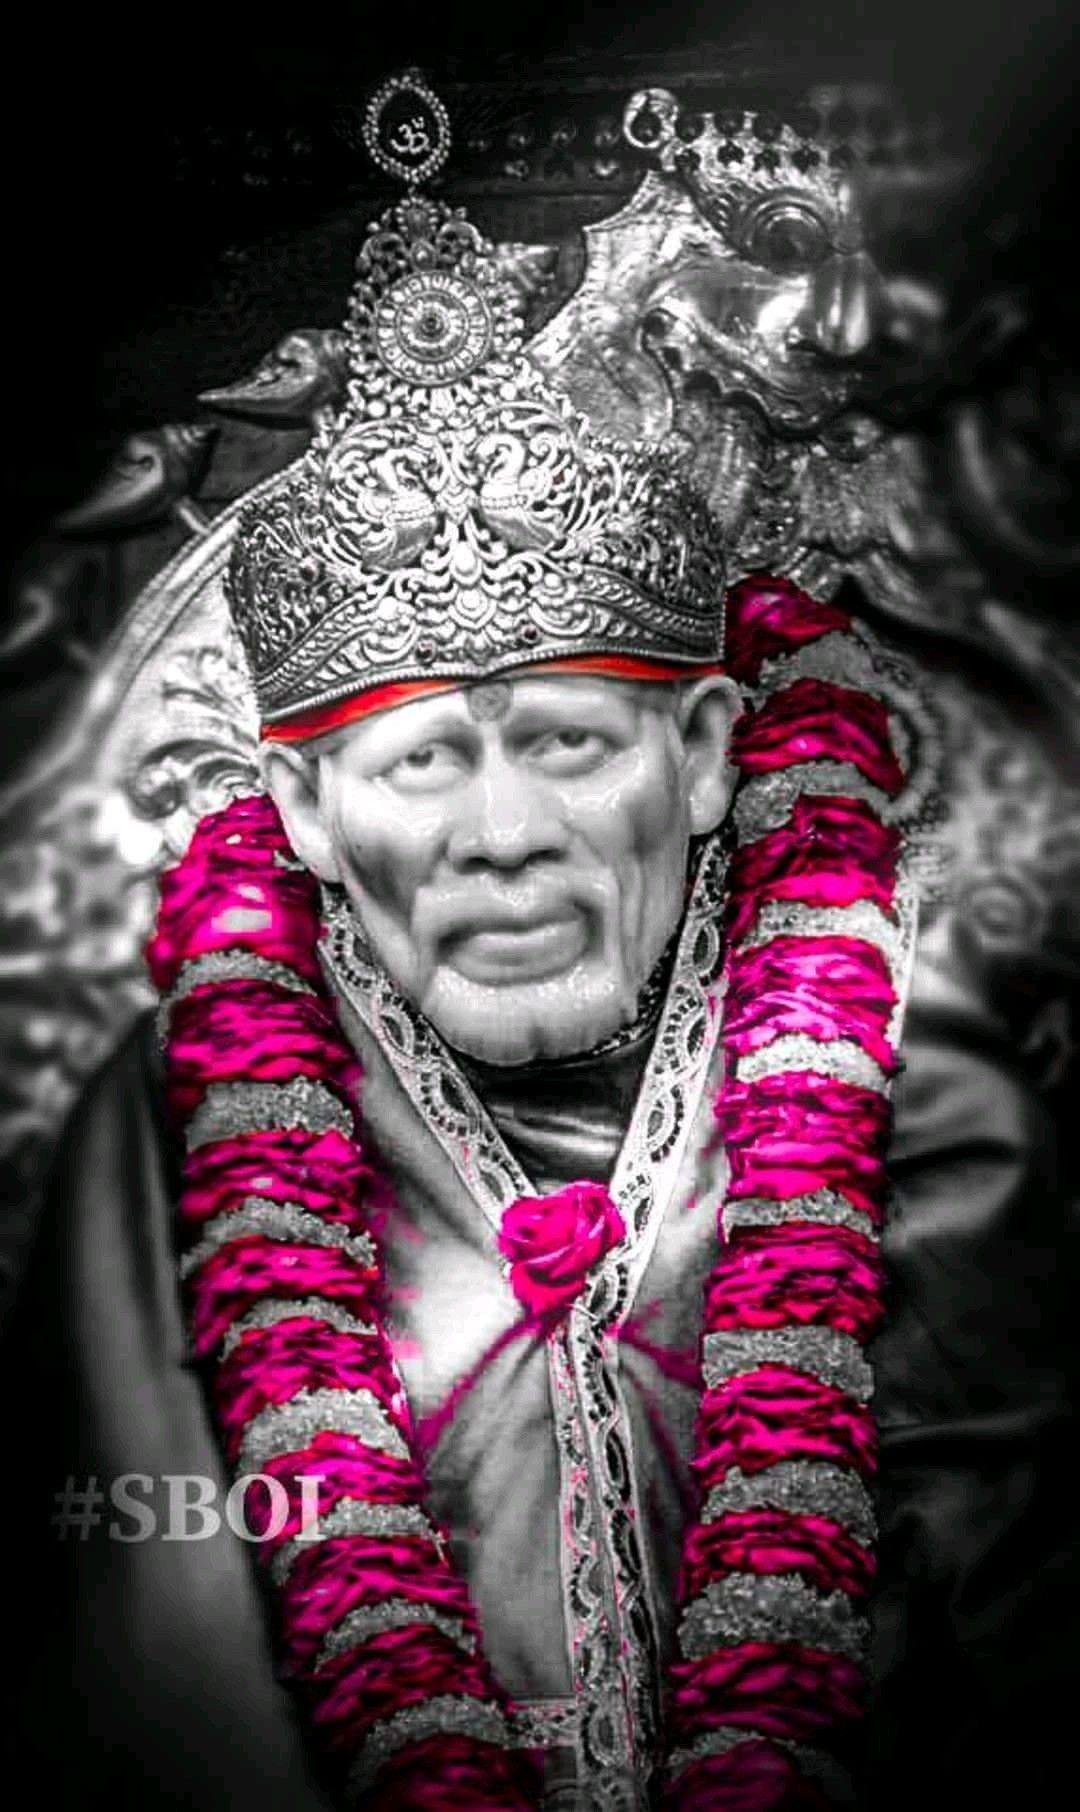 Amazing Pic For God Om Sai Ram Sai Baba Hd Wallpaper Shirdi Sai Baba Wallpapers Sai Baba Wallpapers